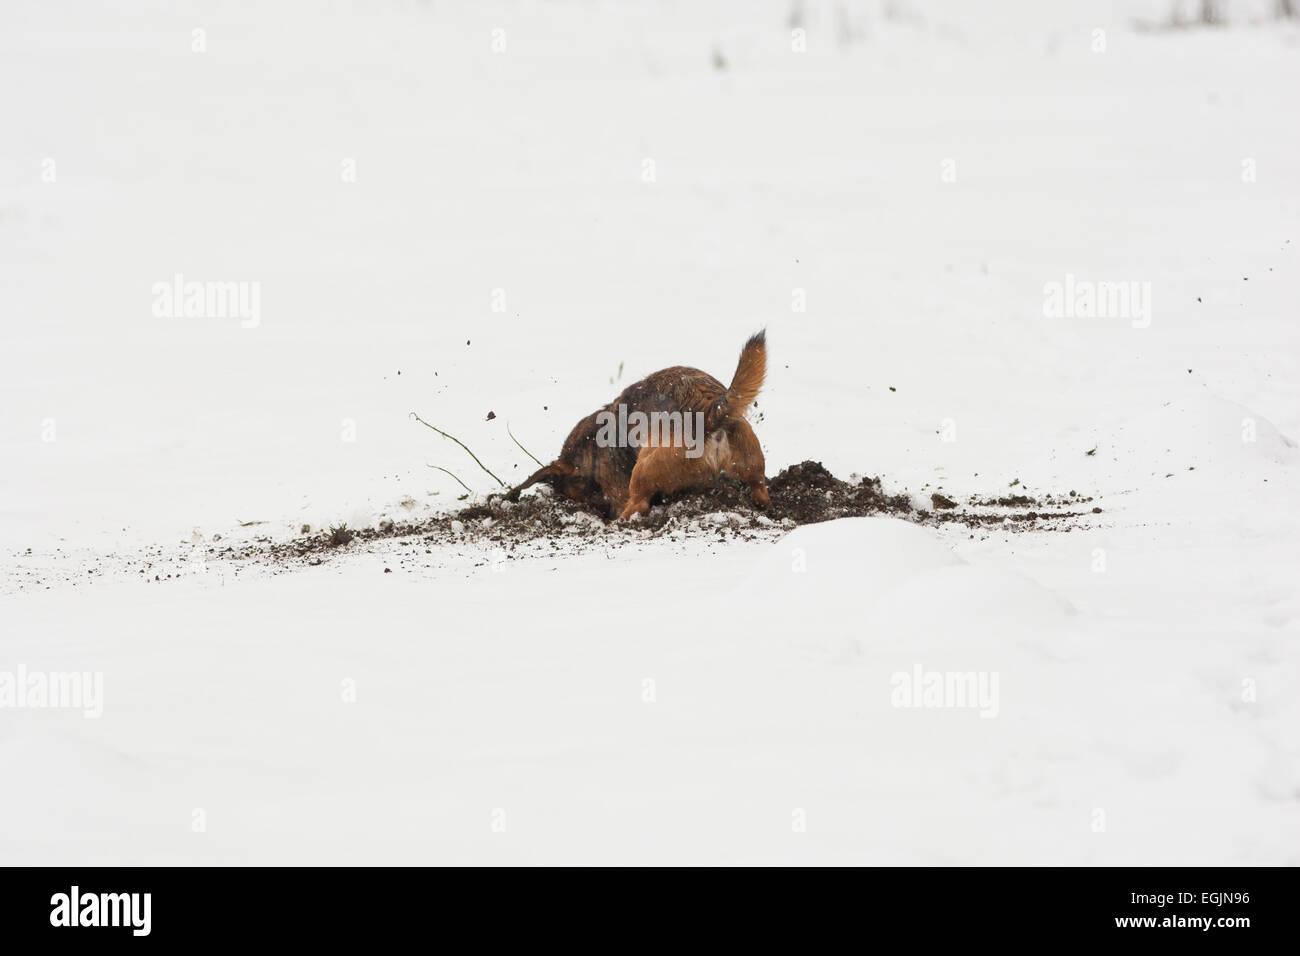 Border terrier cross dog digging in snow - Stock Image